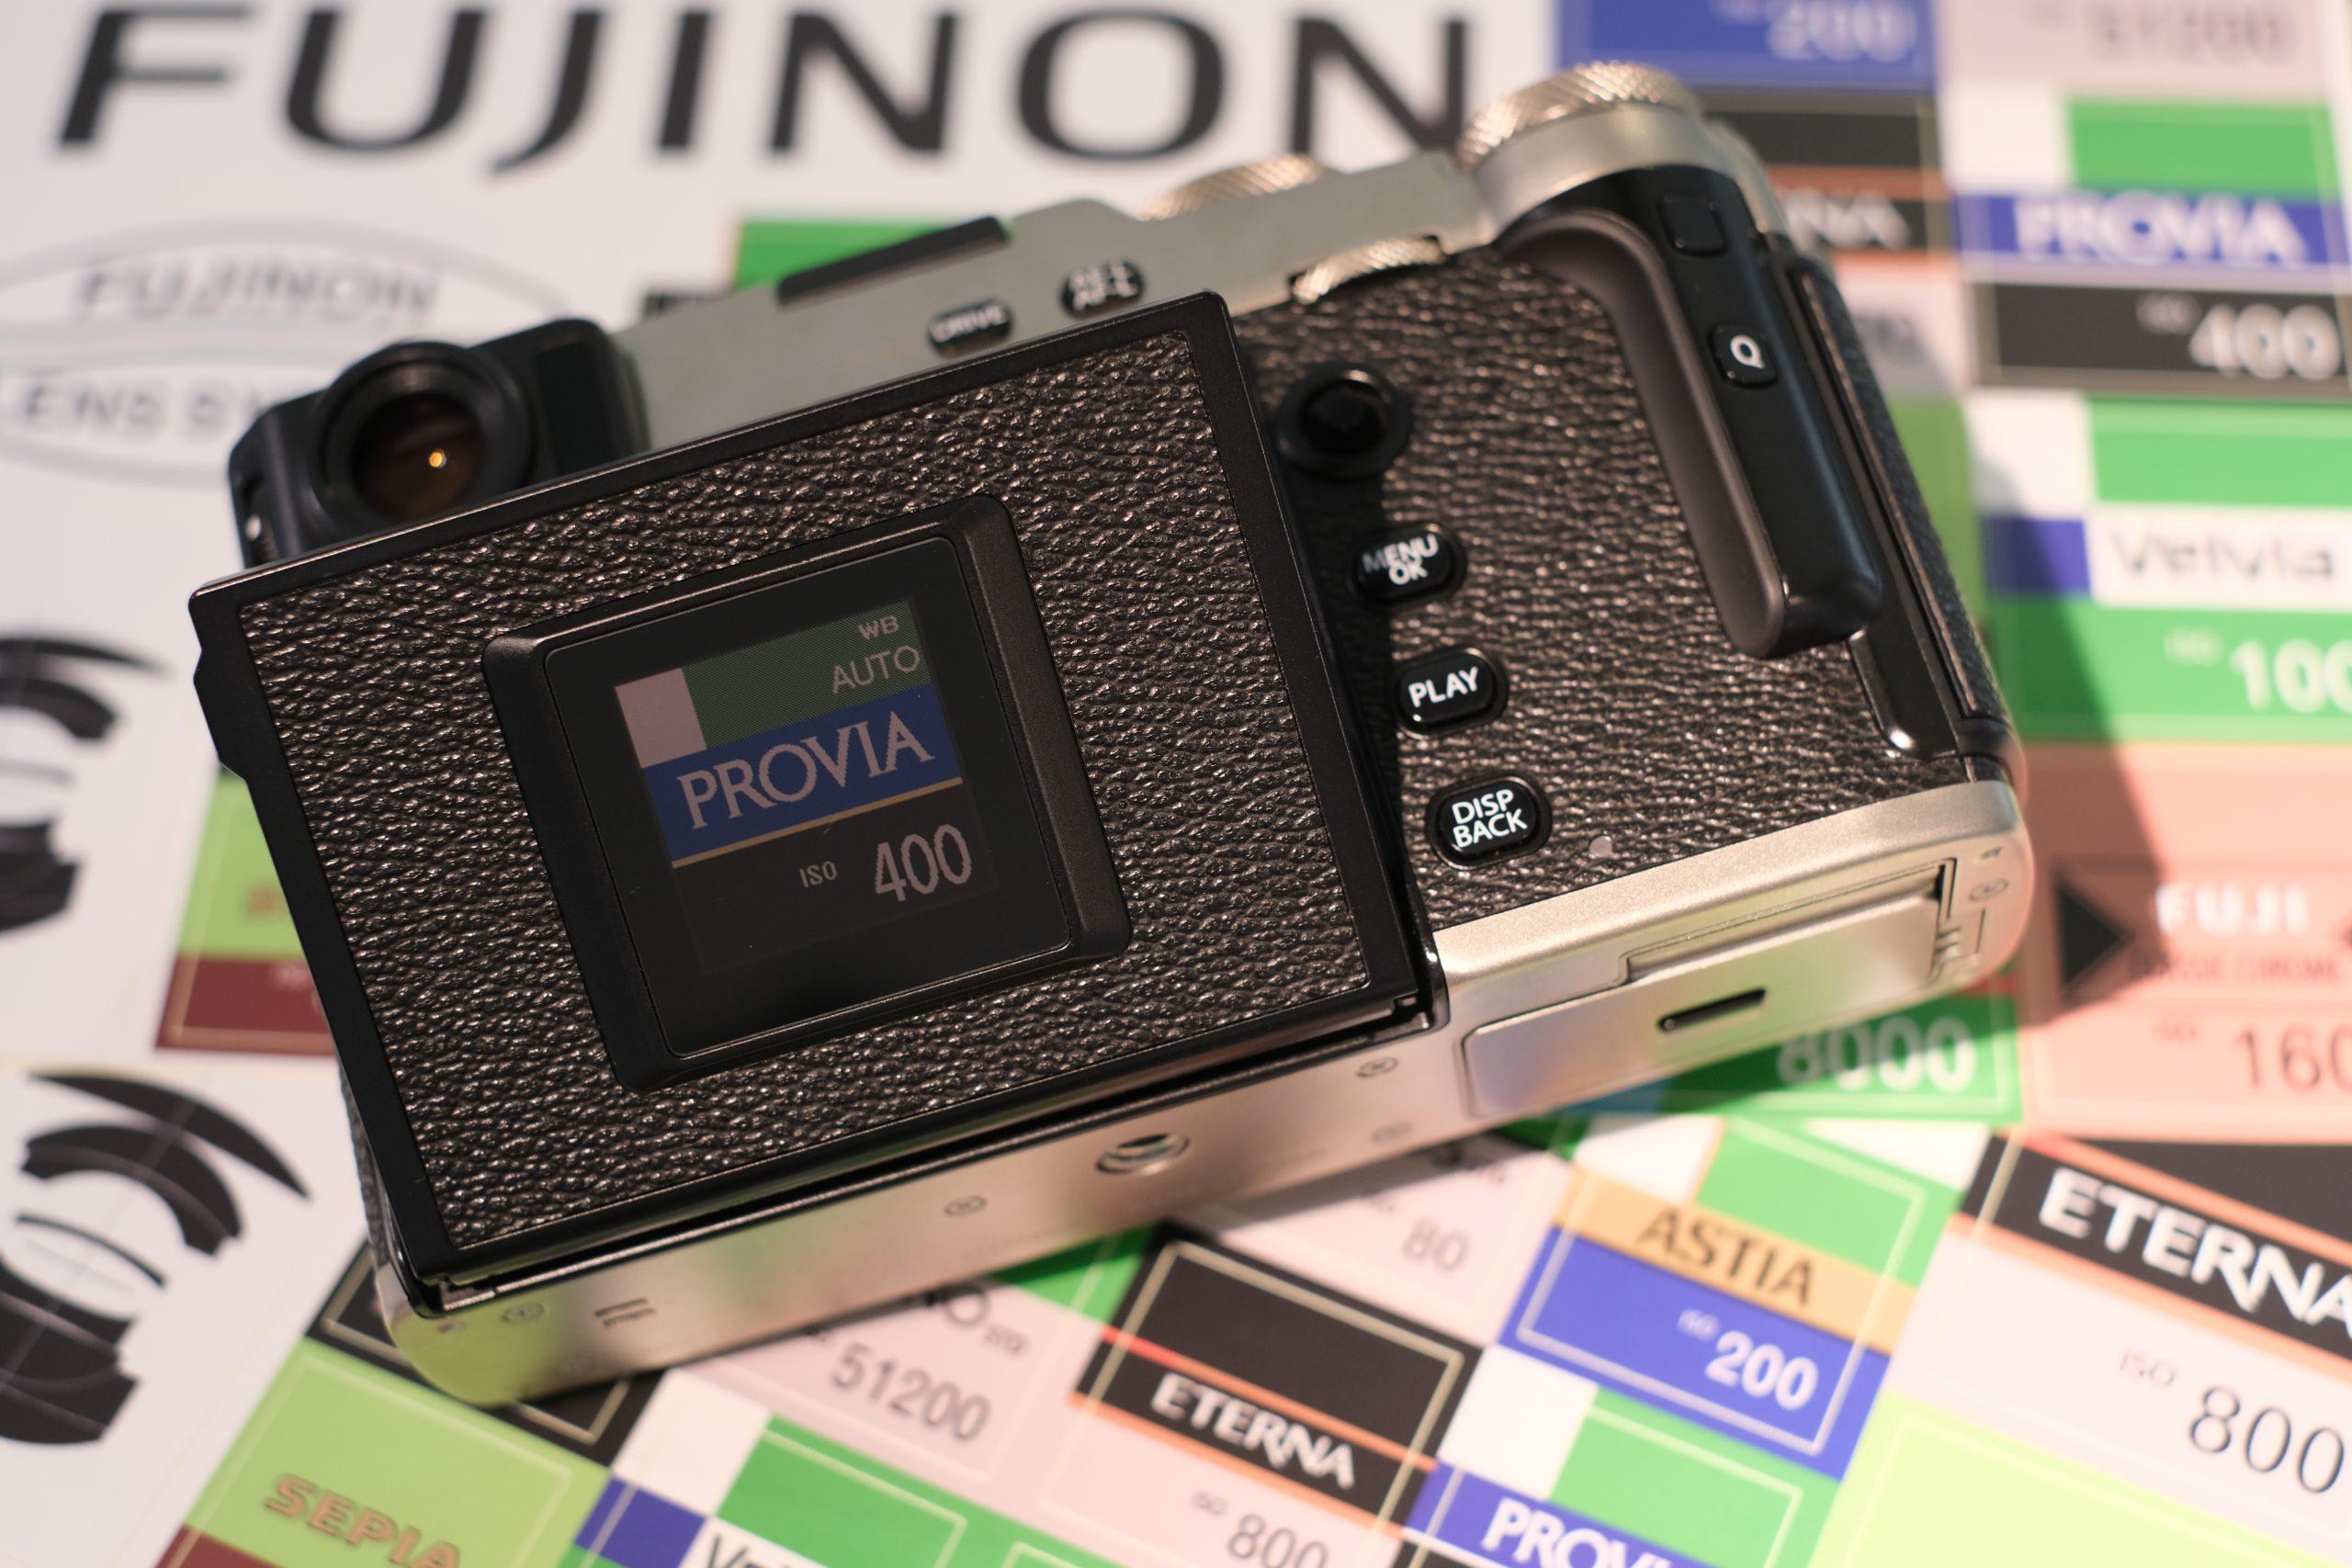 【FUJIFILM】ステッカー × X-Pro3 フィルムシミュレーション写真集